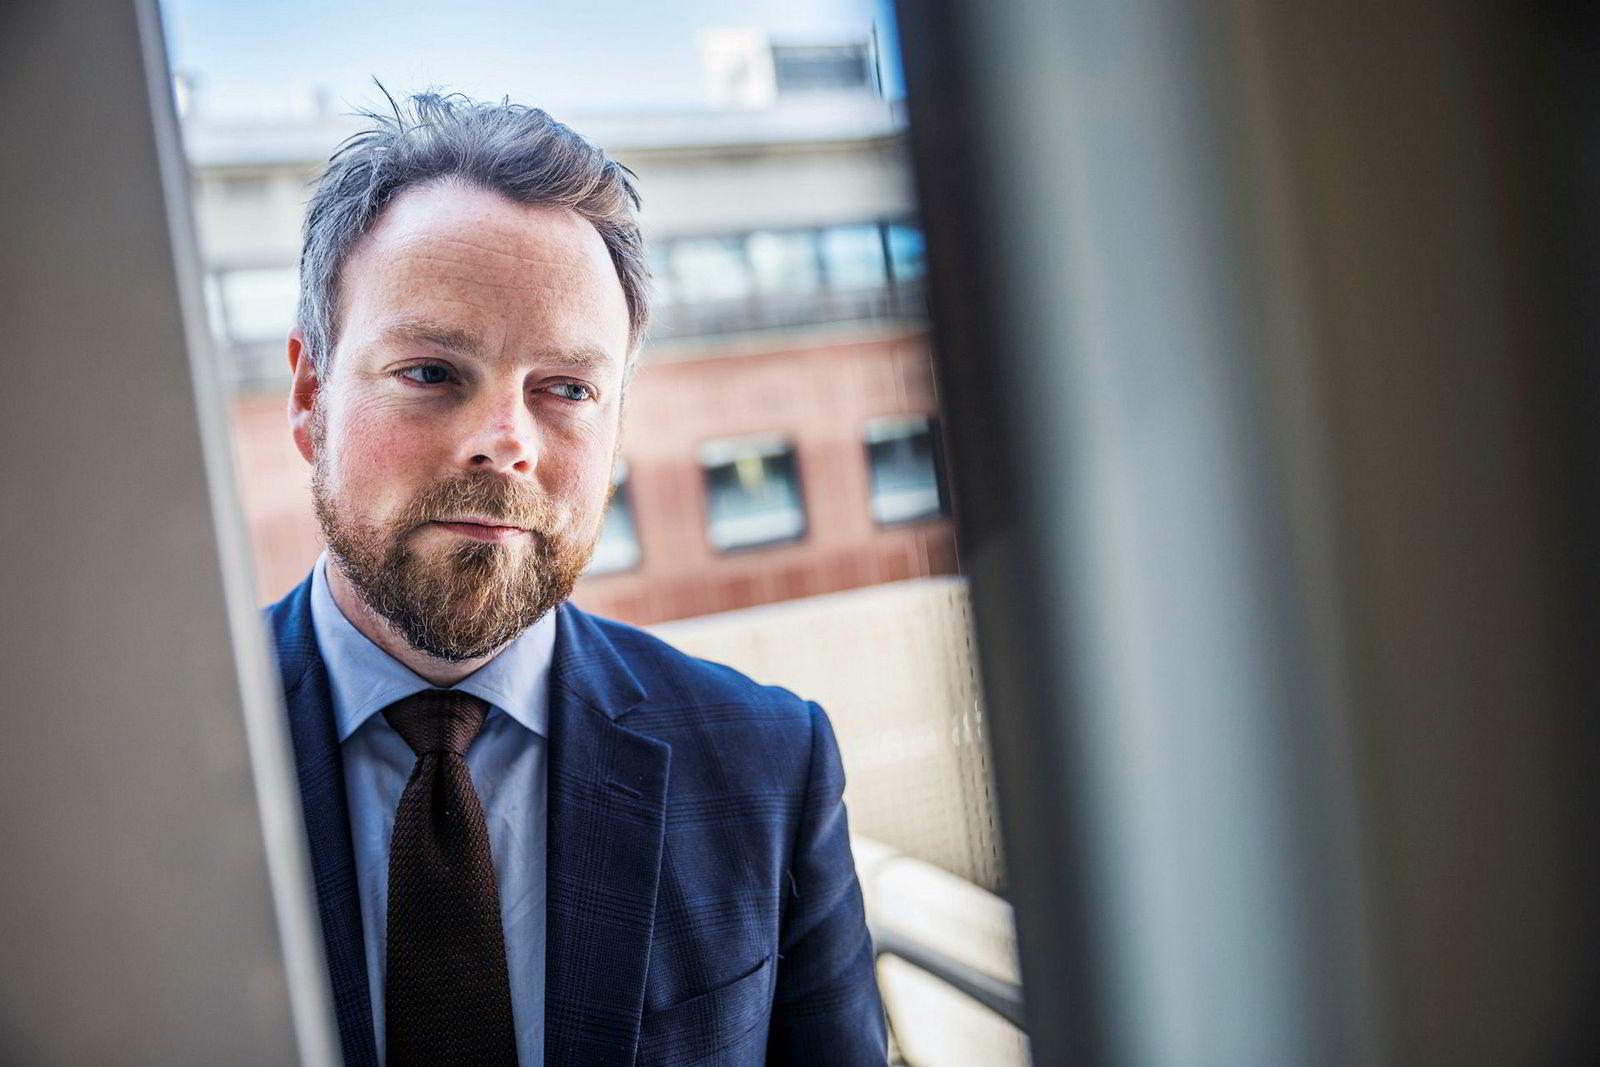 Næringsminister Torbjørn Røe Isaksen vil se på hvordan færre skattepenger kan havne hos søknadsskrivere.